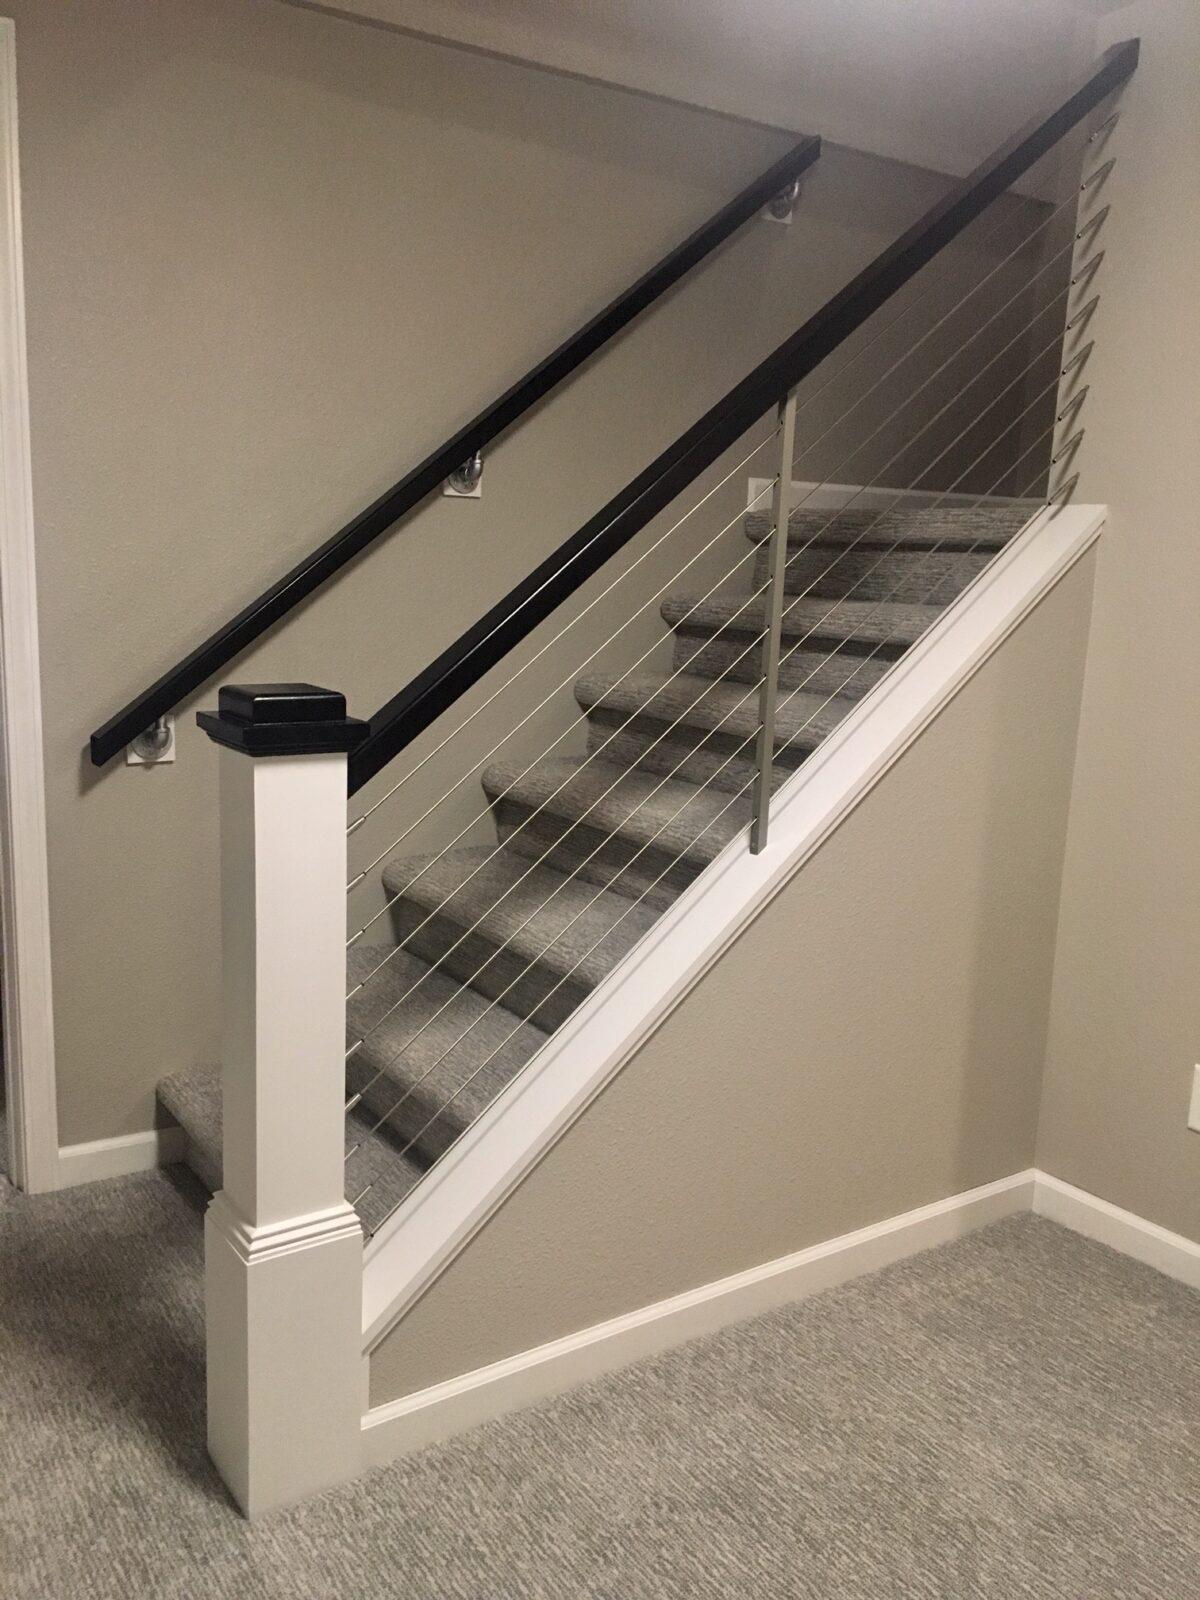 Stairway carpet   H&R Carpets and Flooring